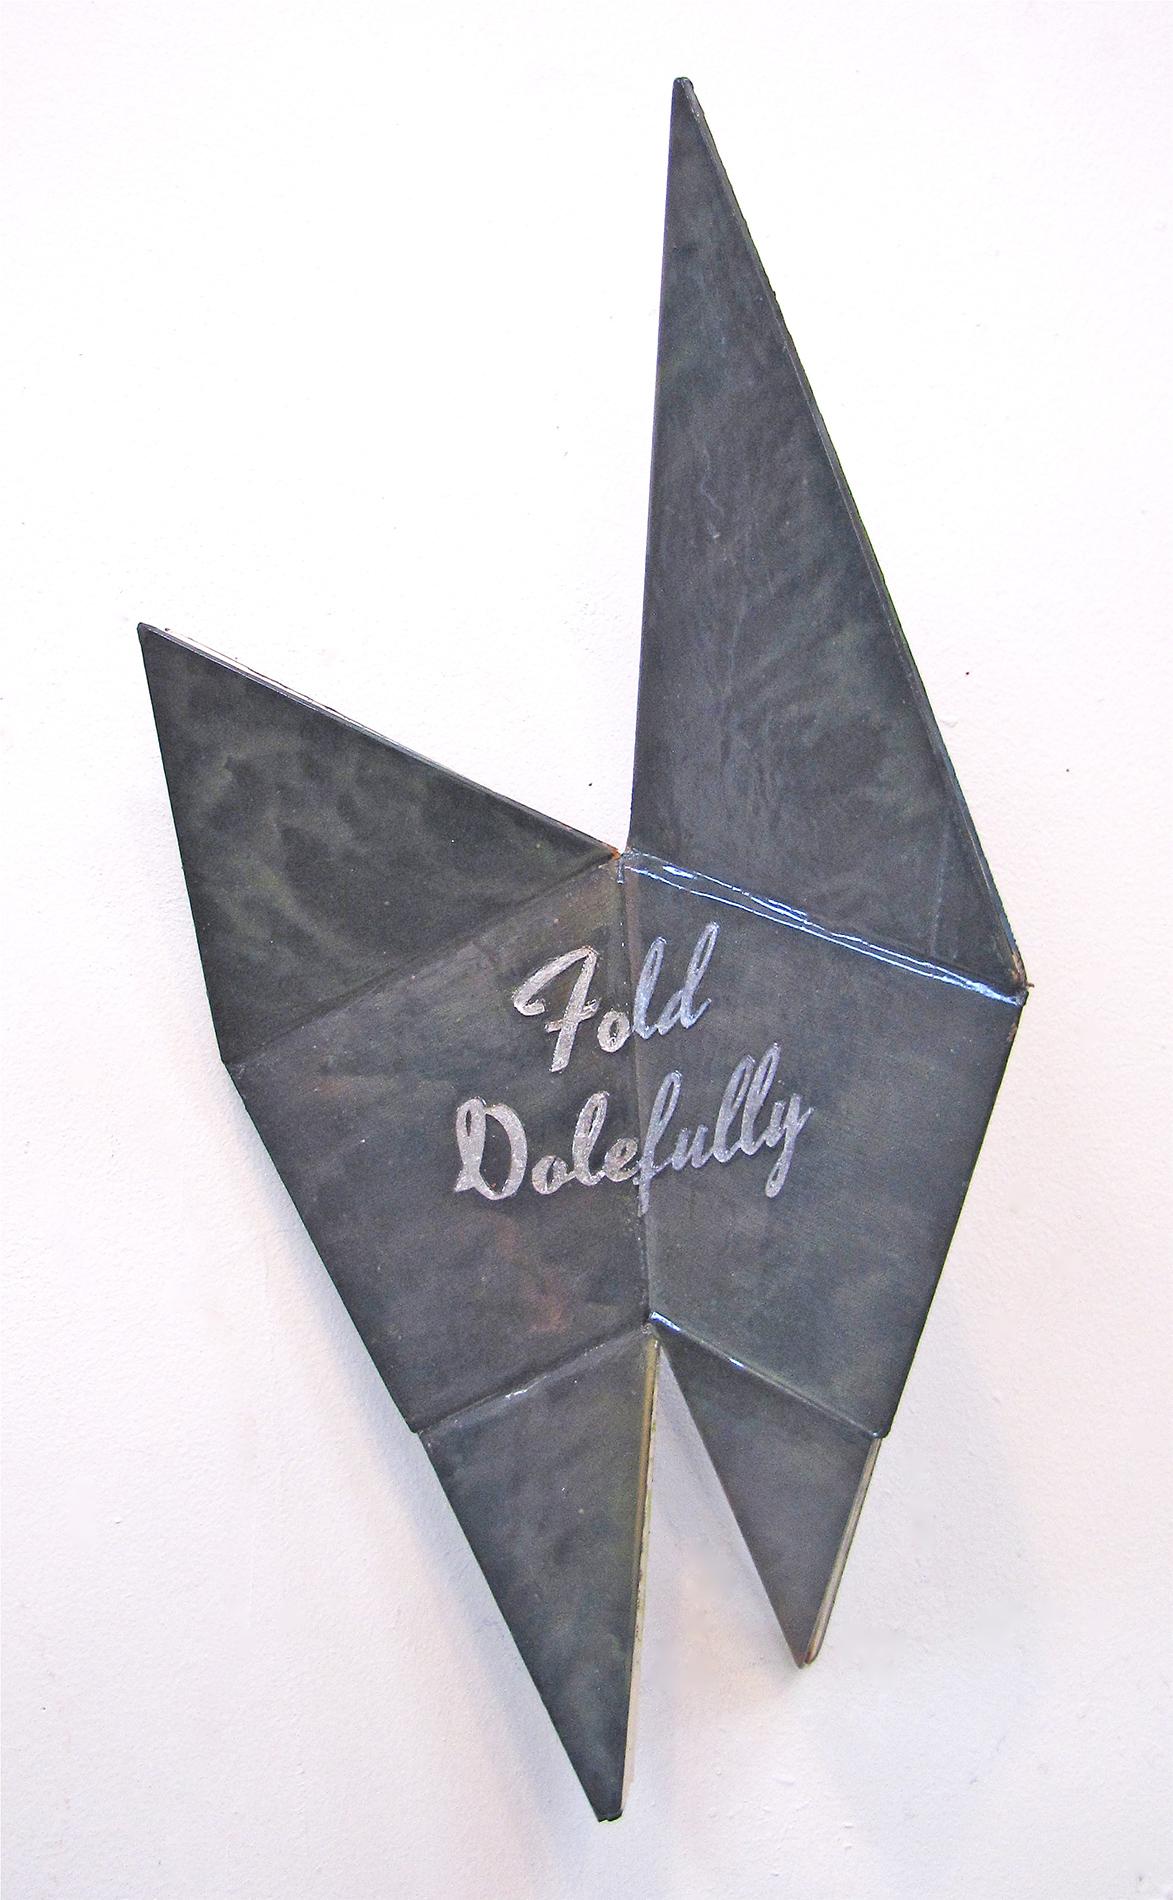 Exhortations 3: Fold dolefully